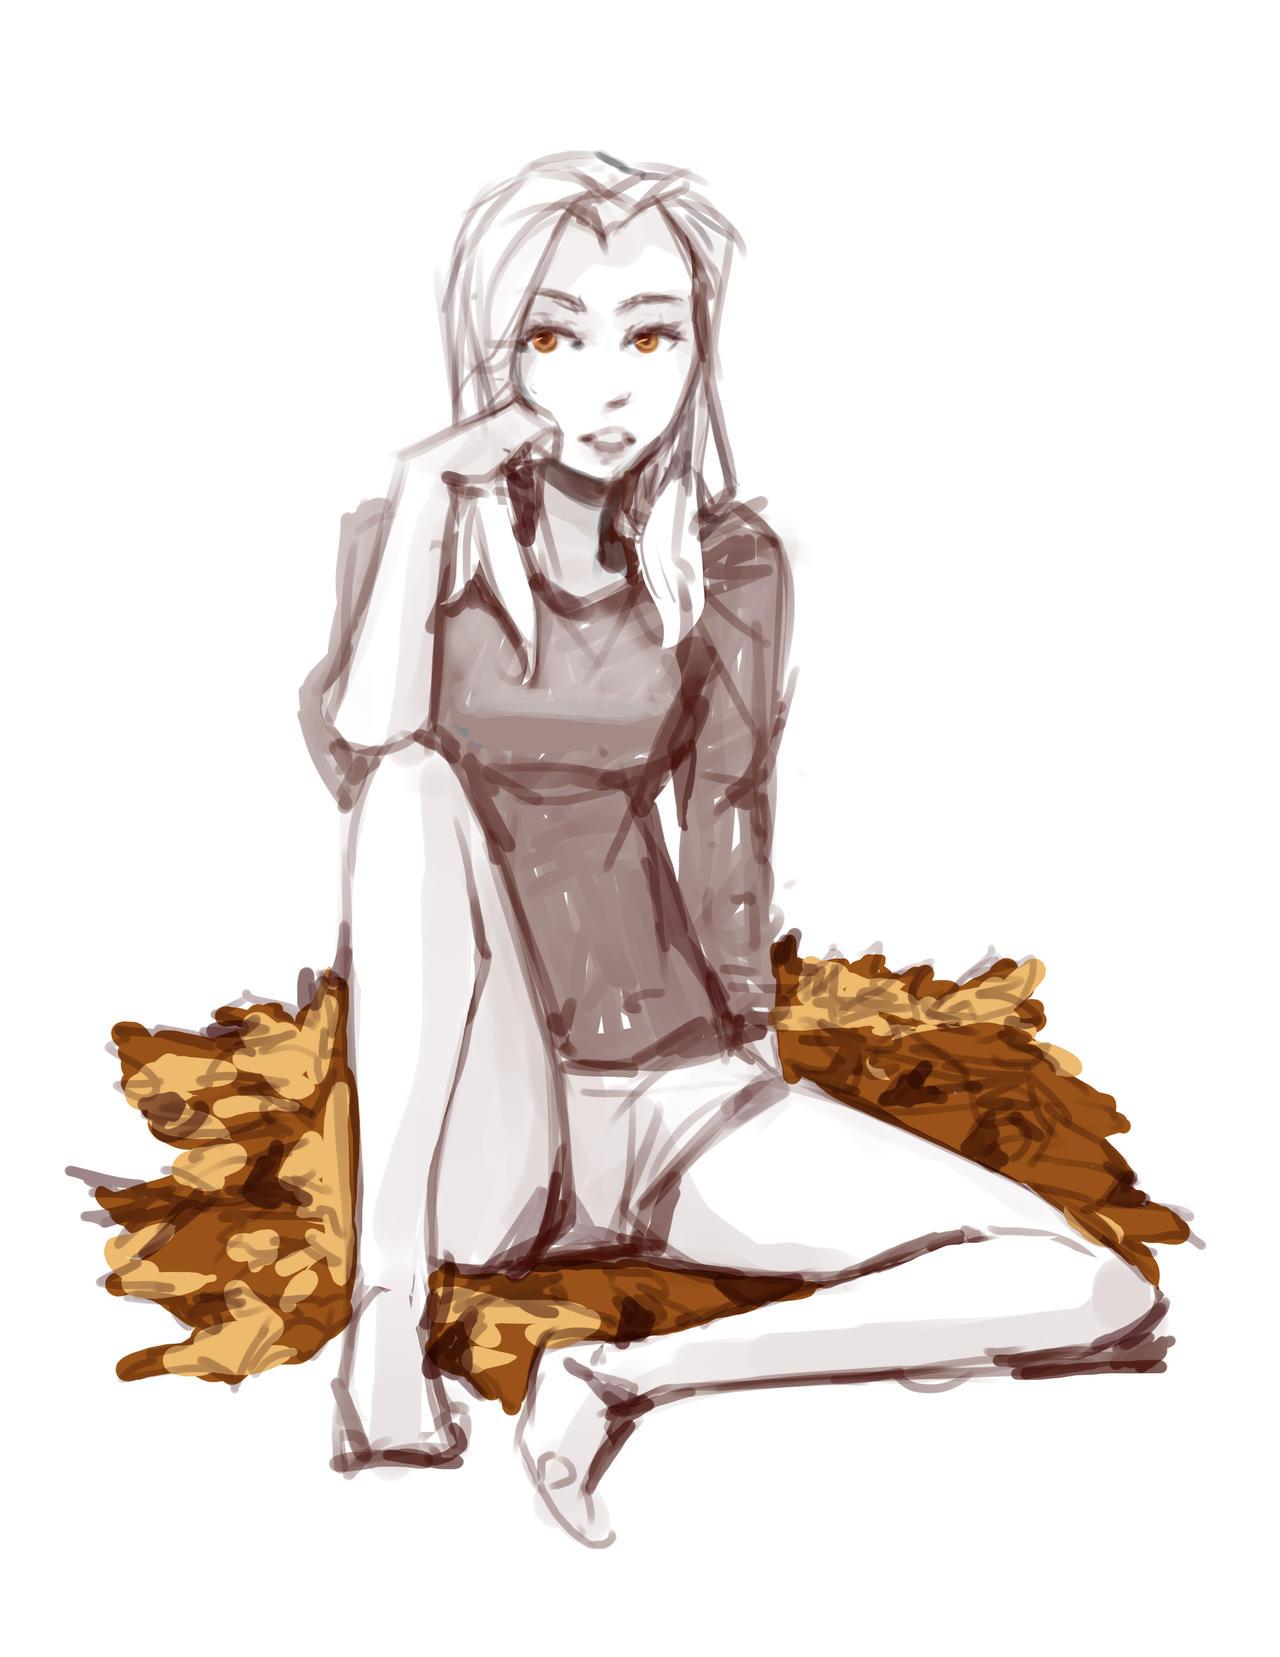 Laufey, Mother of Loki